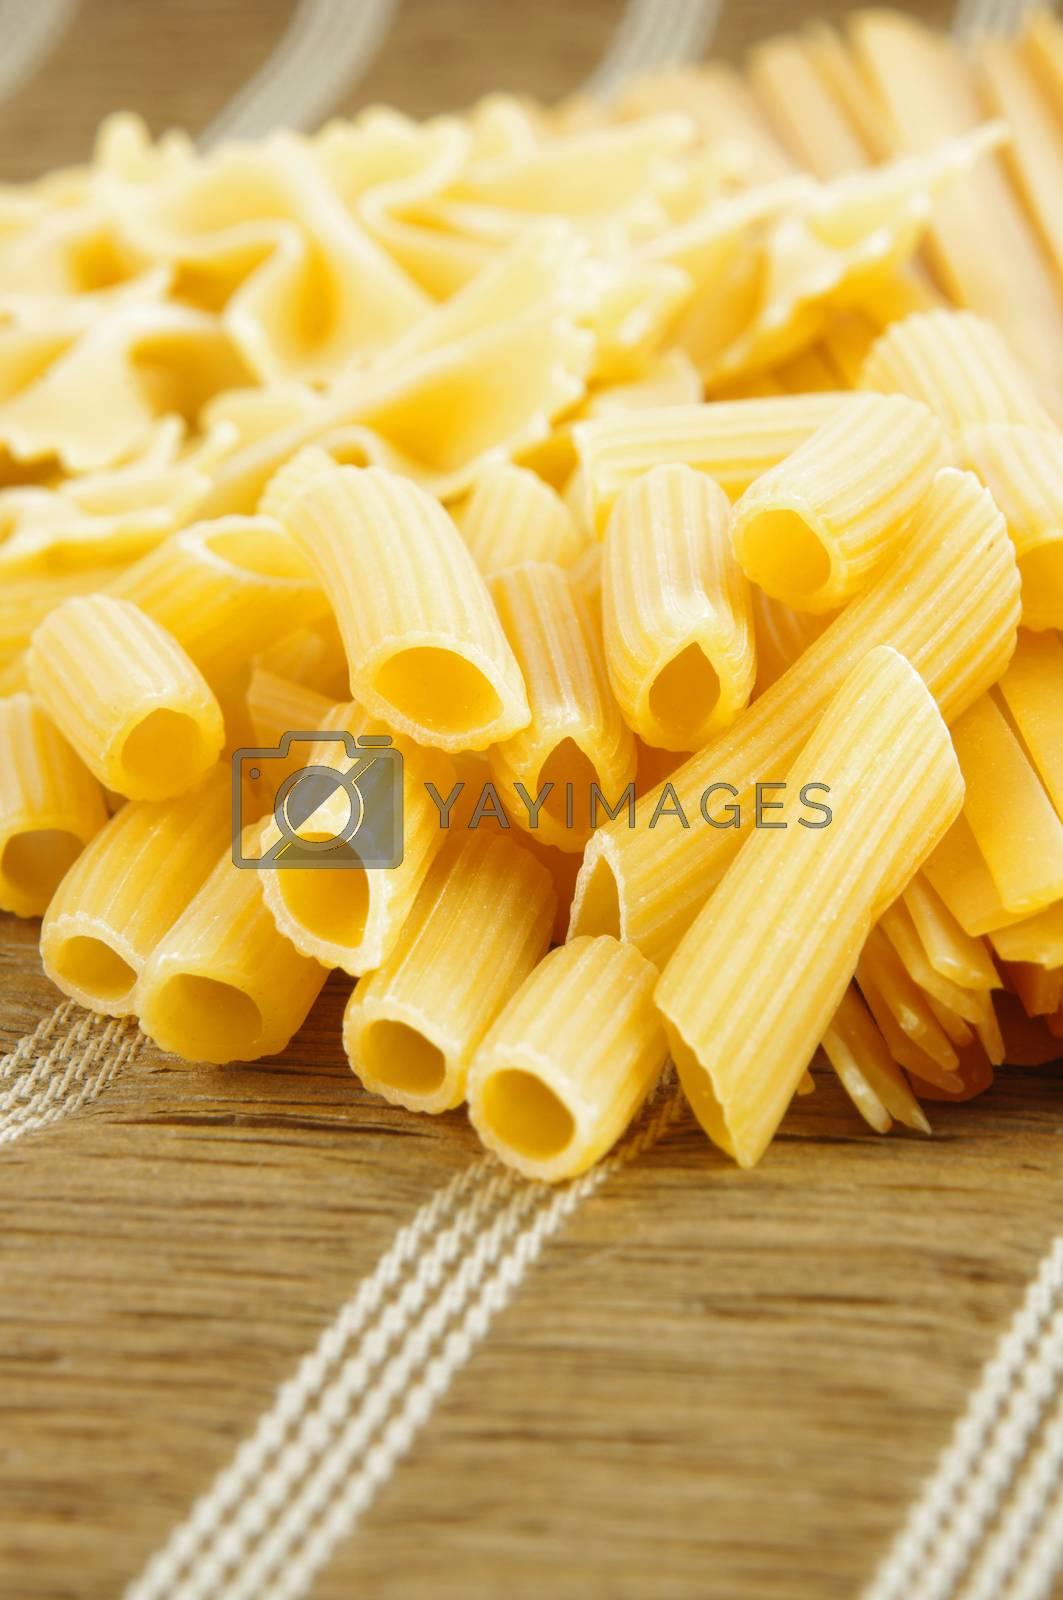 raw pasta closeup on table.shallow dof